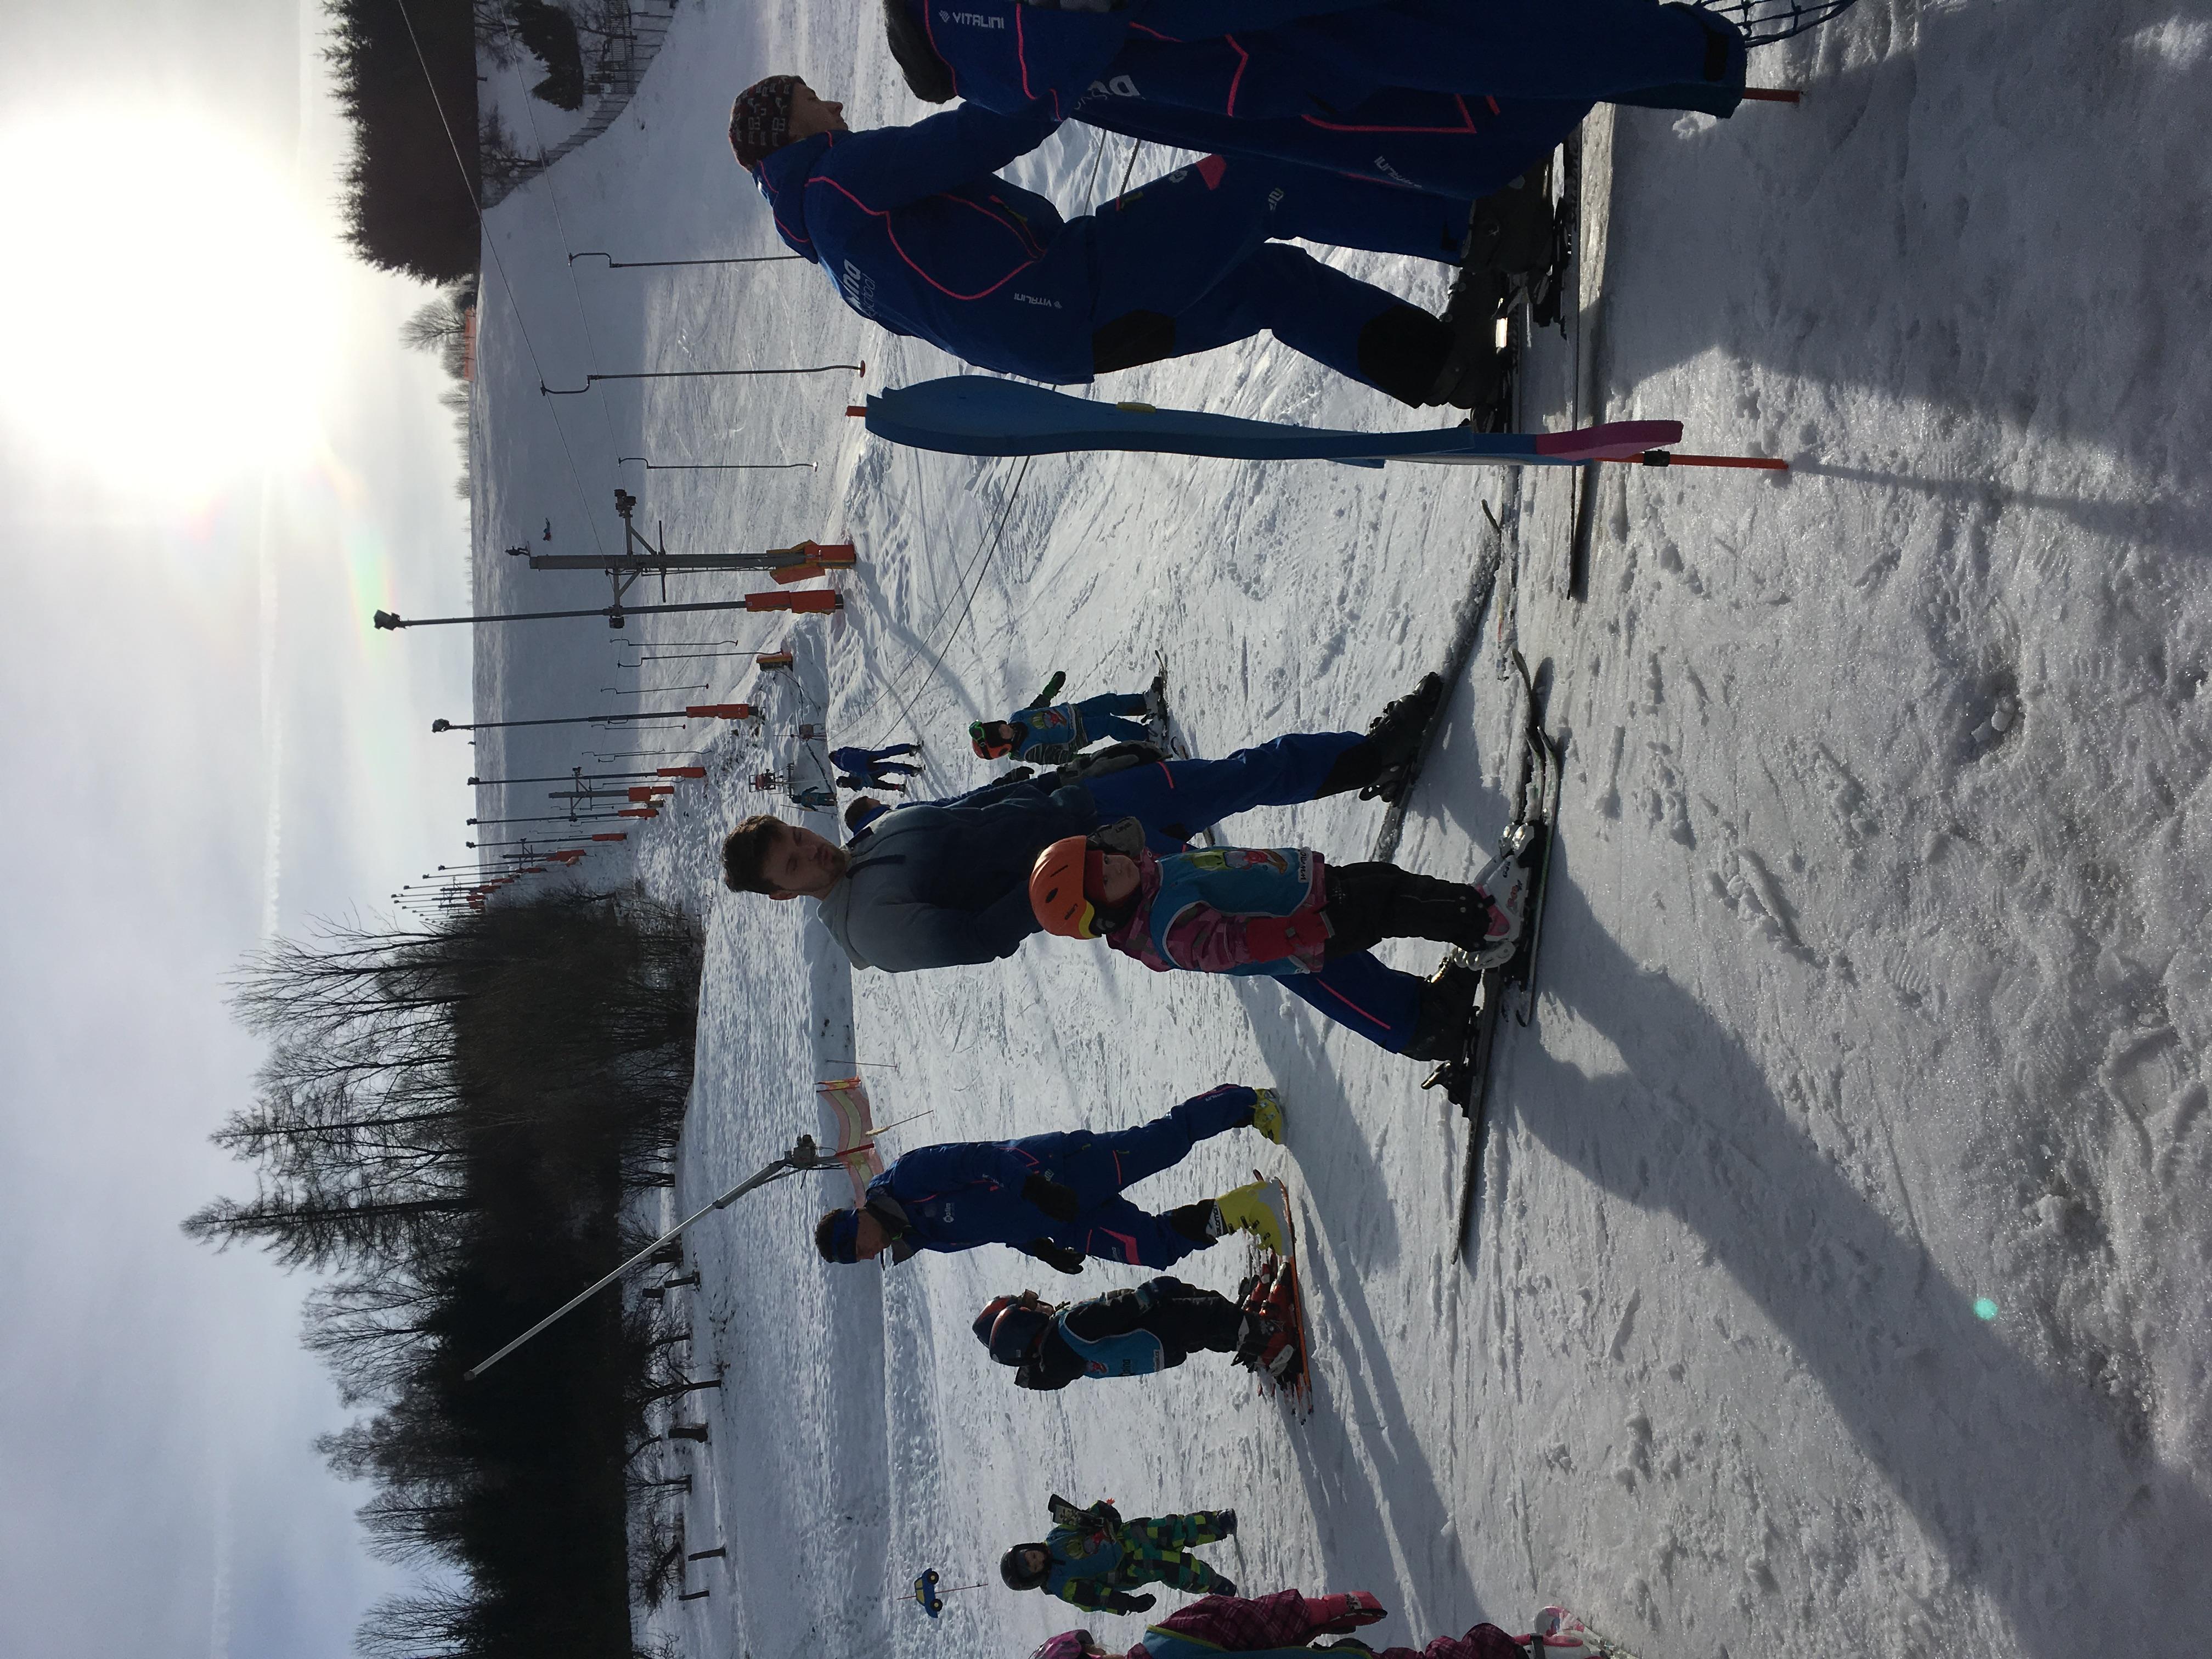 Kurs narciarski 2018